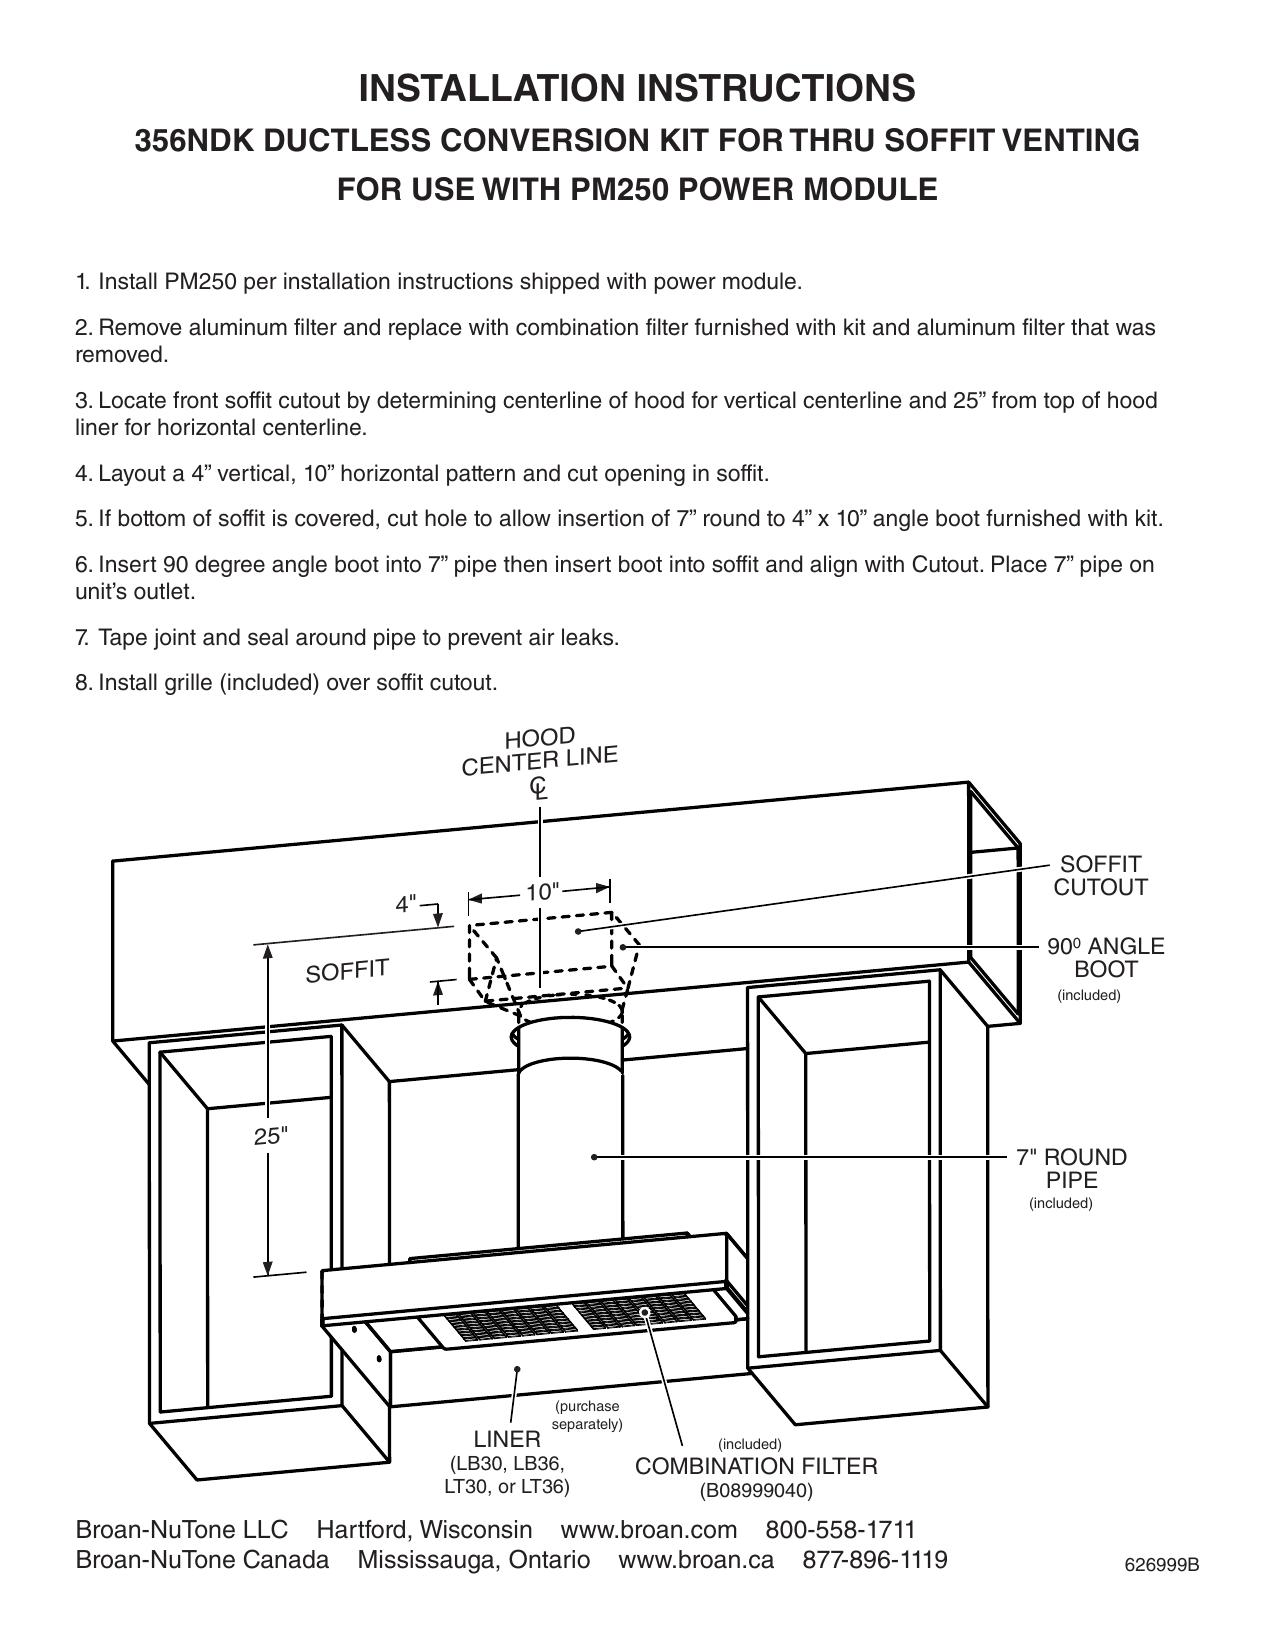 Hdi 19p Kit Hood Kit Manual Guide